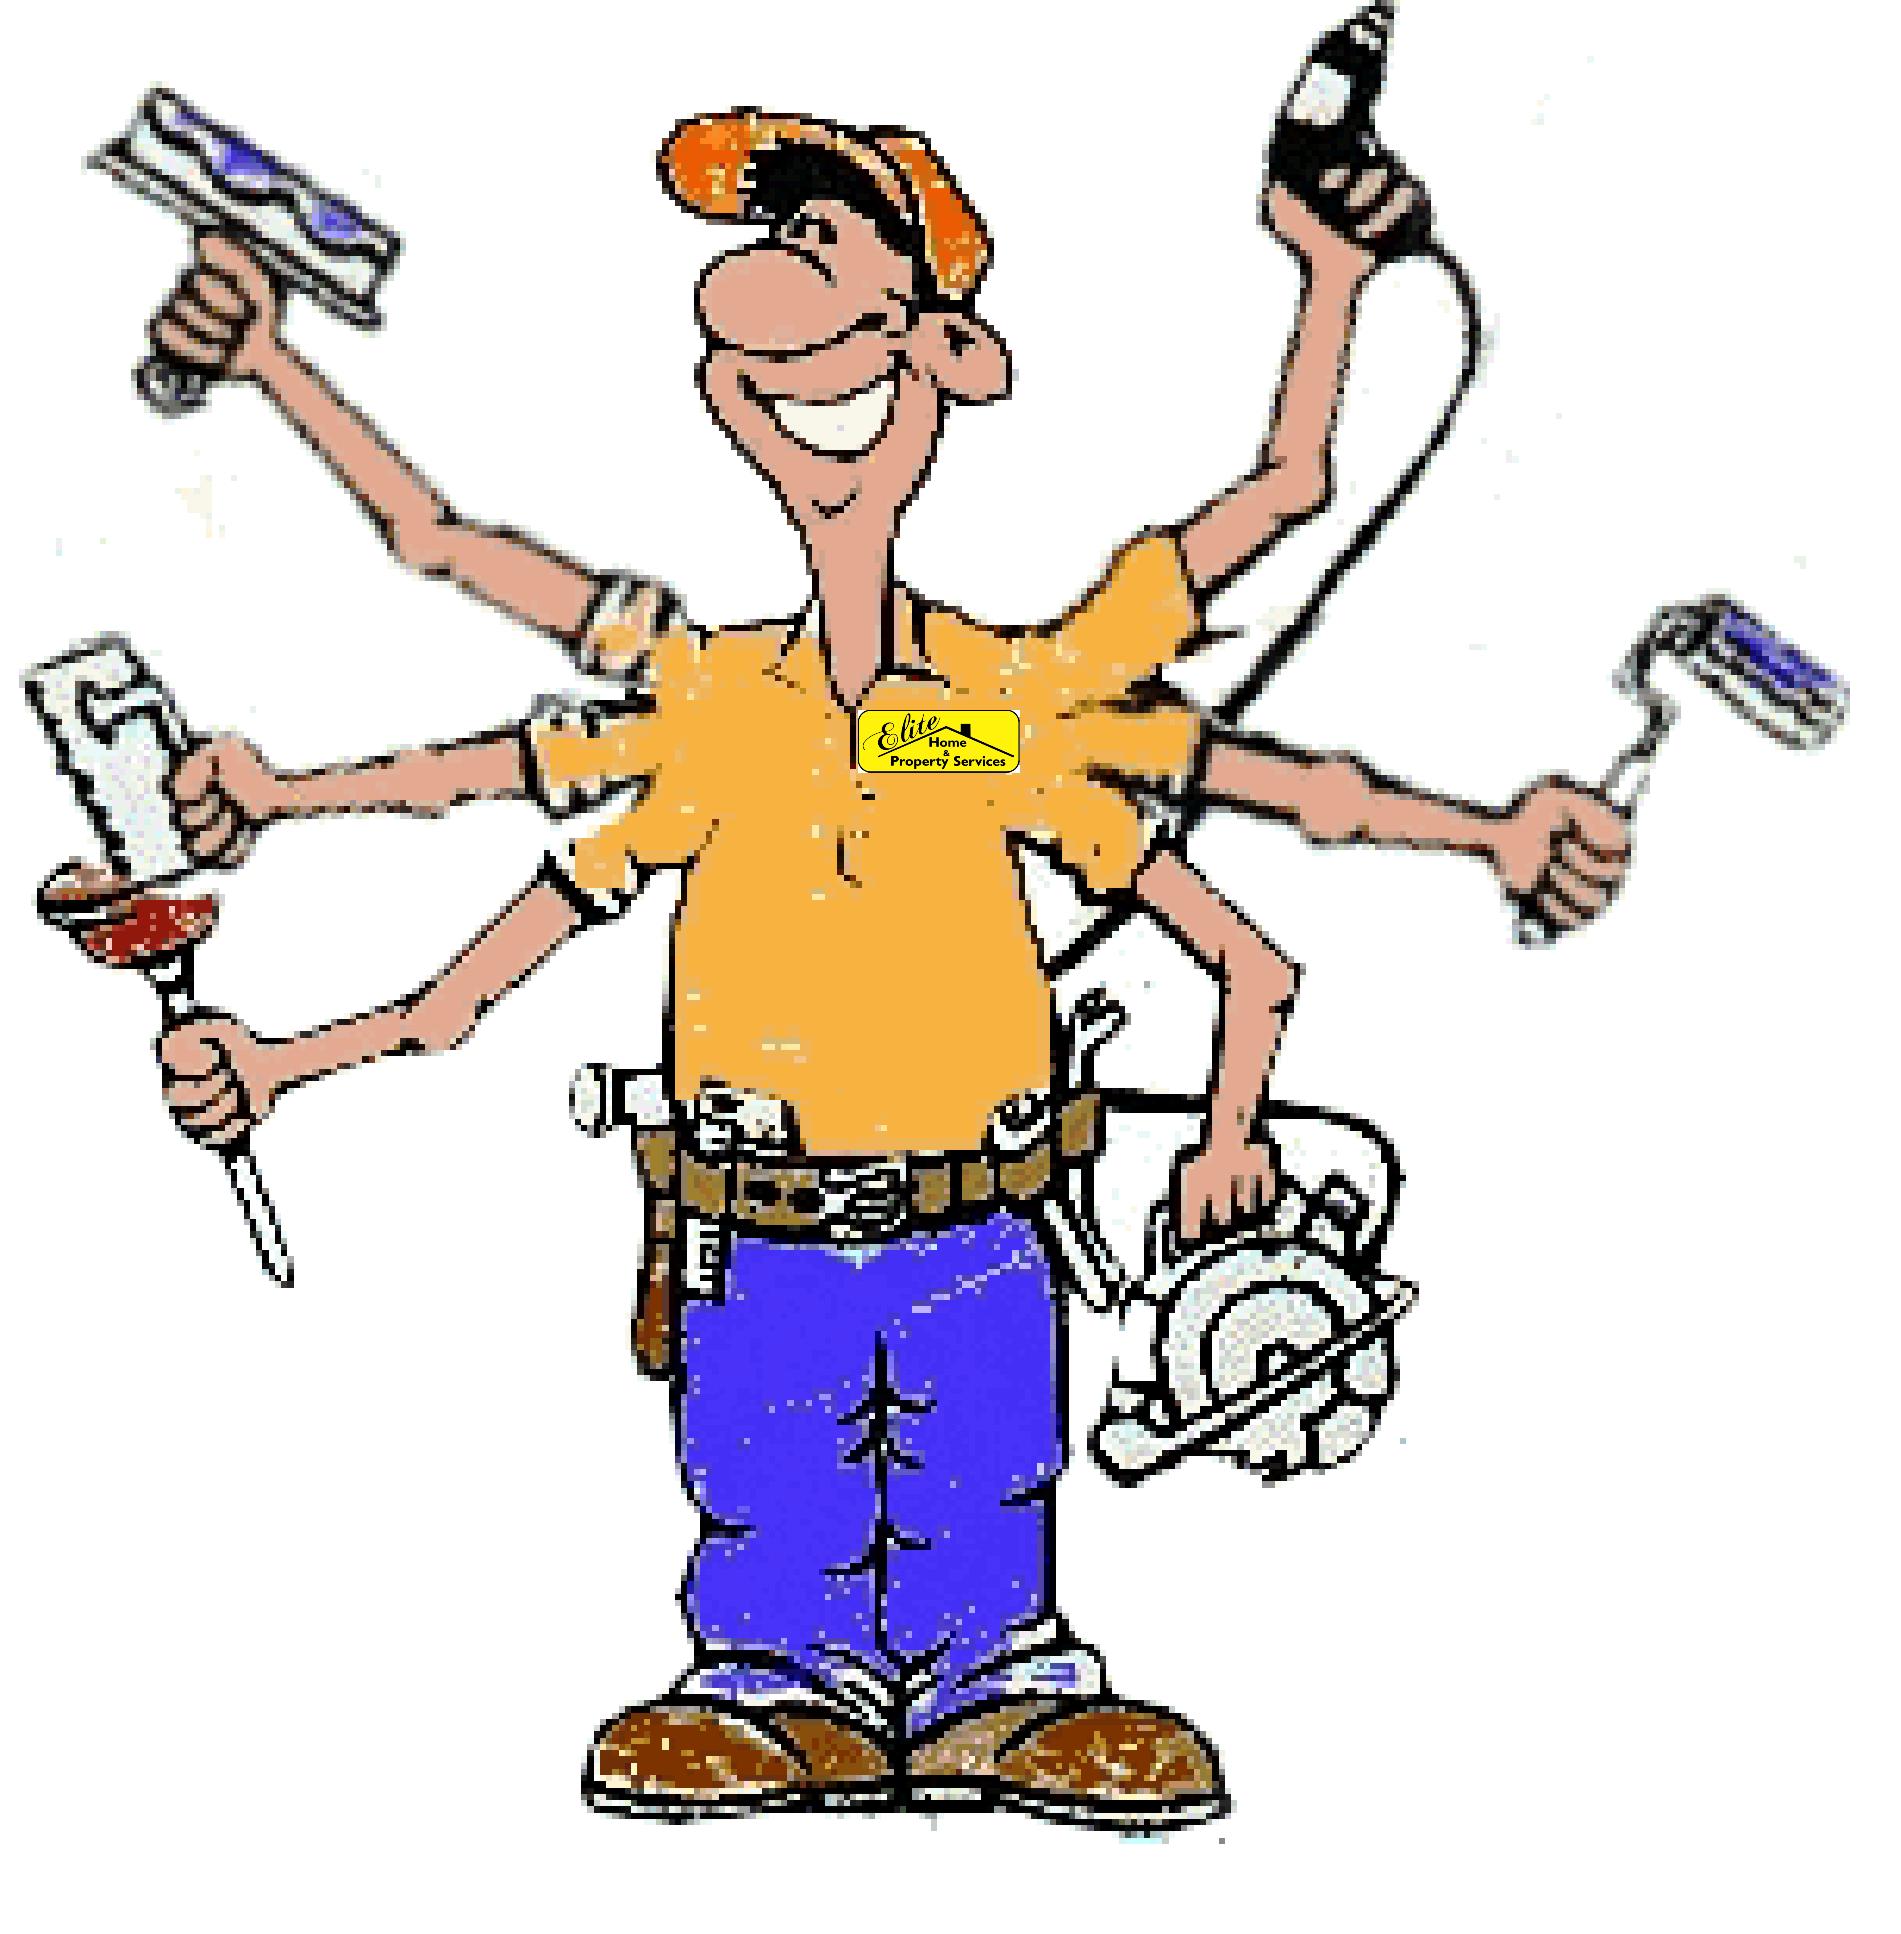 handyman clipart handyman logo clipart panda free clipart images rh clipartpanda com handyman clipart free handyman graphics clipart